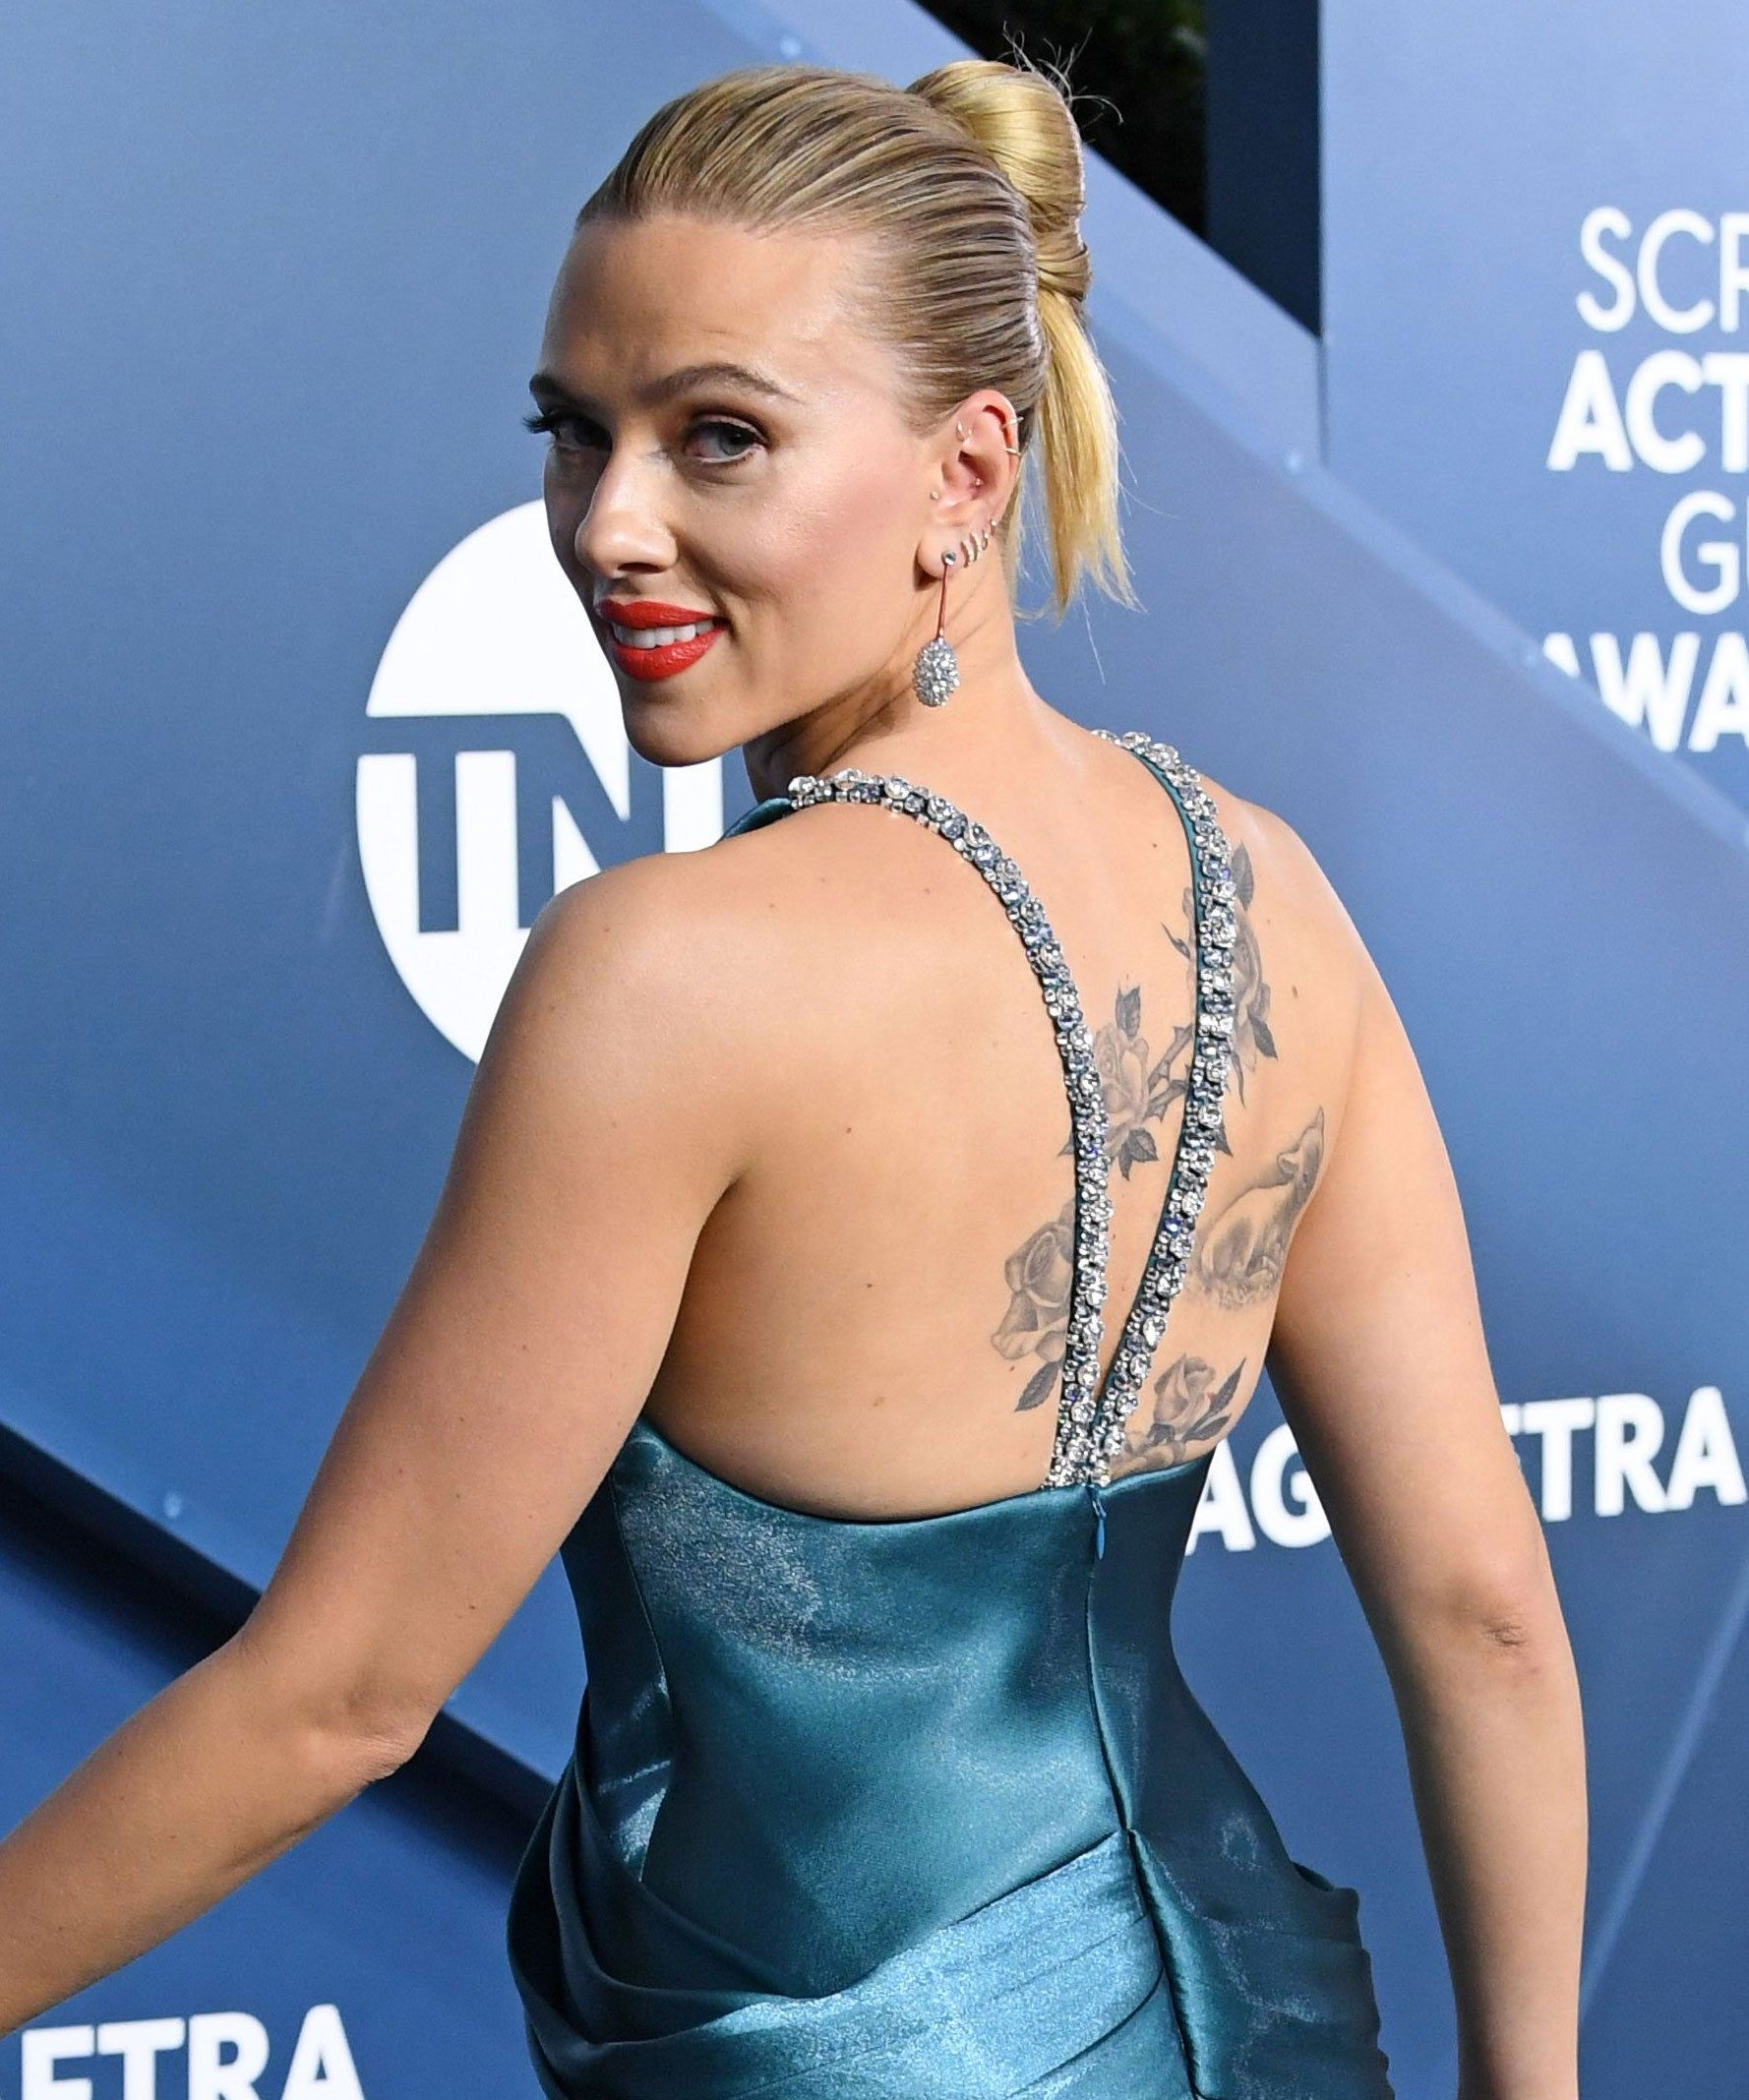 Scarlett Johansson Shows Off Her Massive Back Tattoo At Sag Awards In 2020 Scarlett Johansson Hairstyle Scarlett Johansson Scarlet Johansson